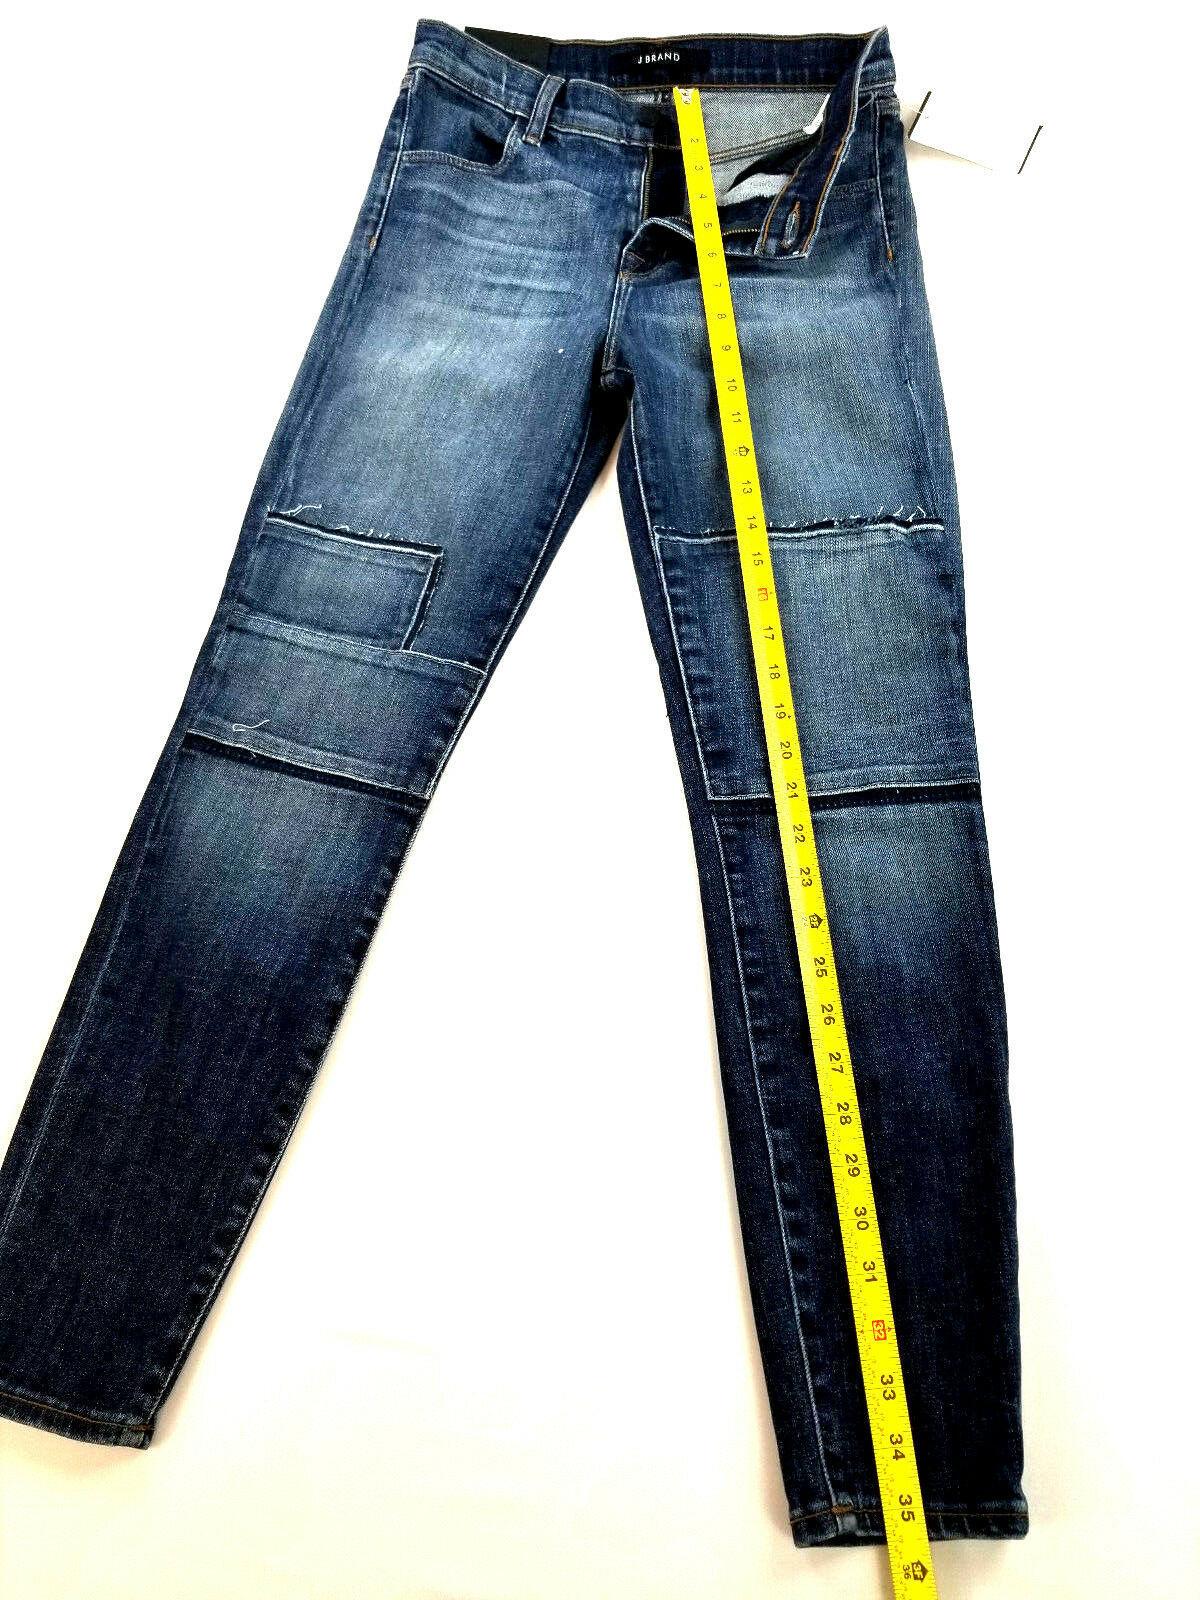 new J BRAND women jeans Jasper Patched JB001098 high rise crop 26 blue MSRP $298 image 4